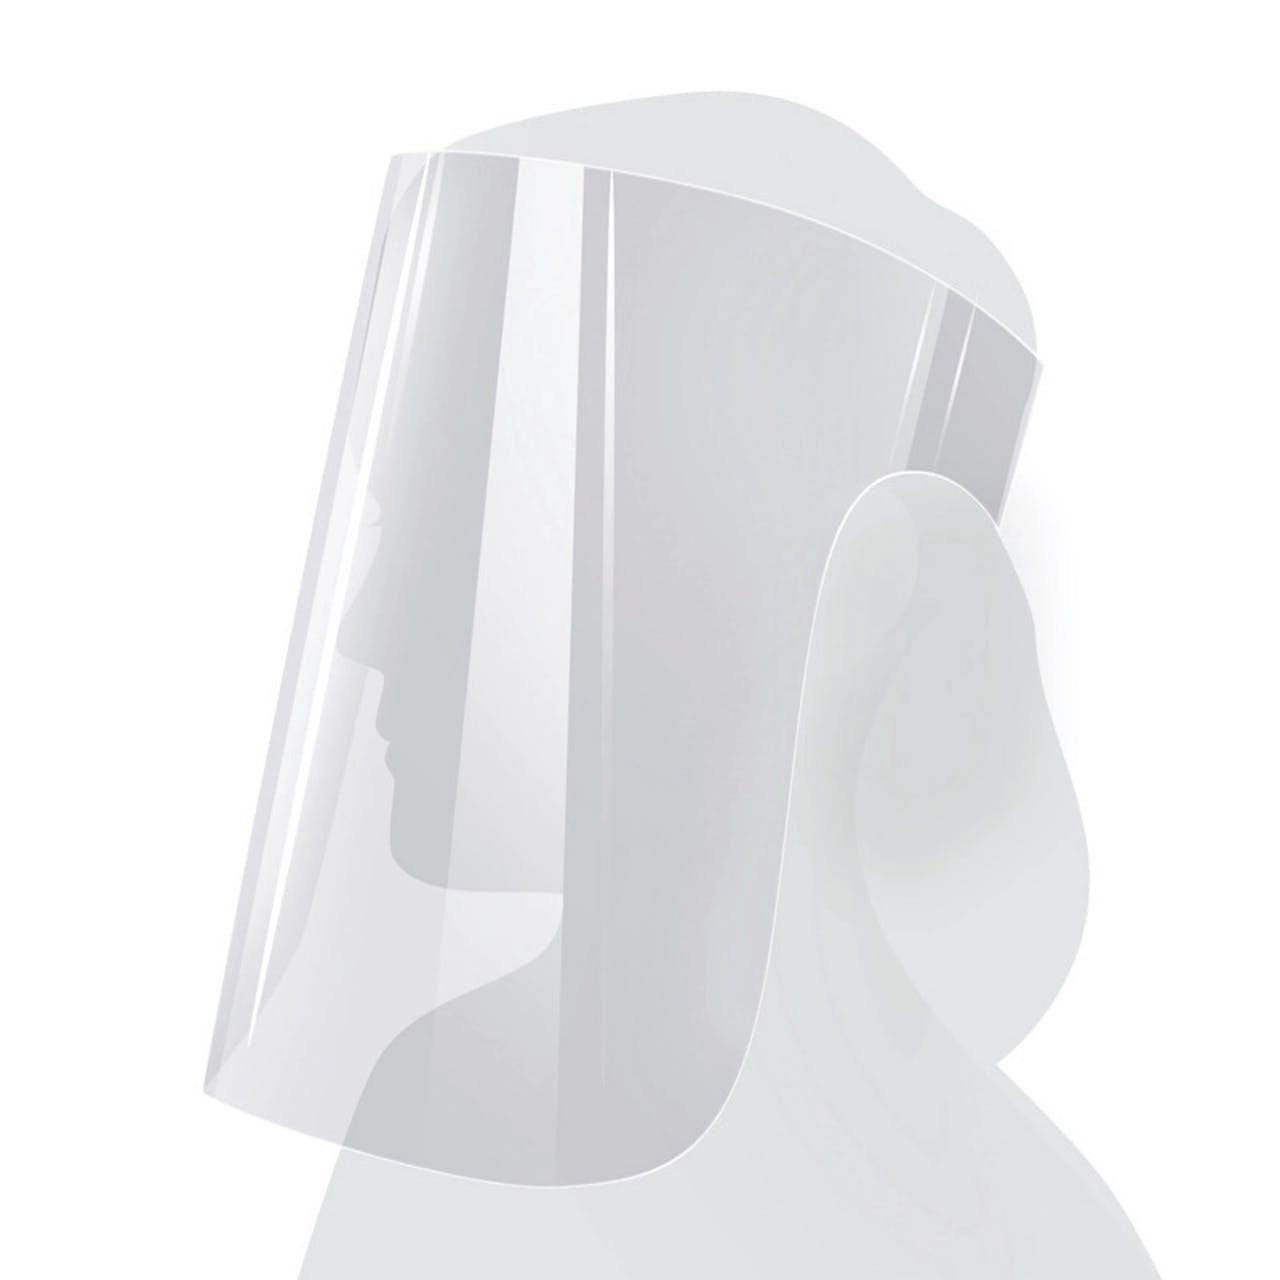 Protection du visage ECONOMY, Var: GS-E